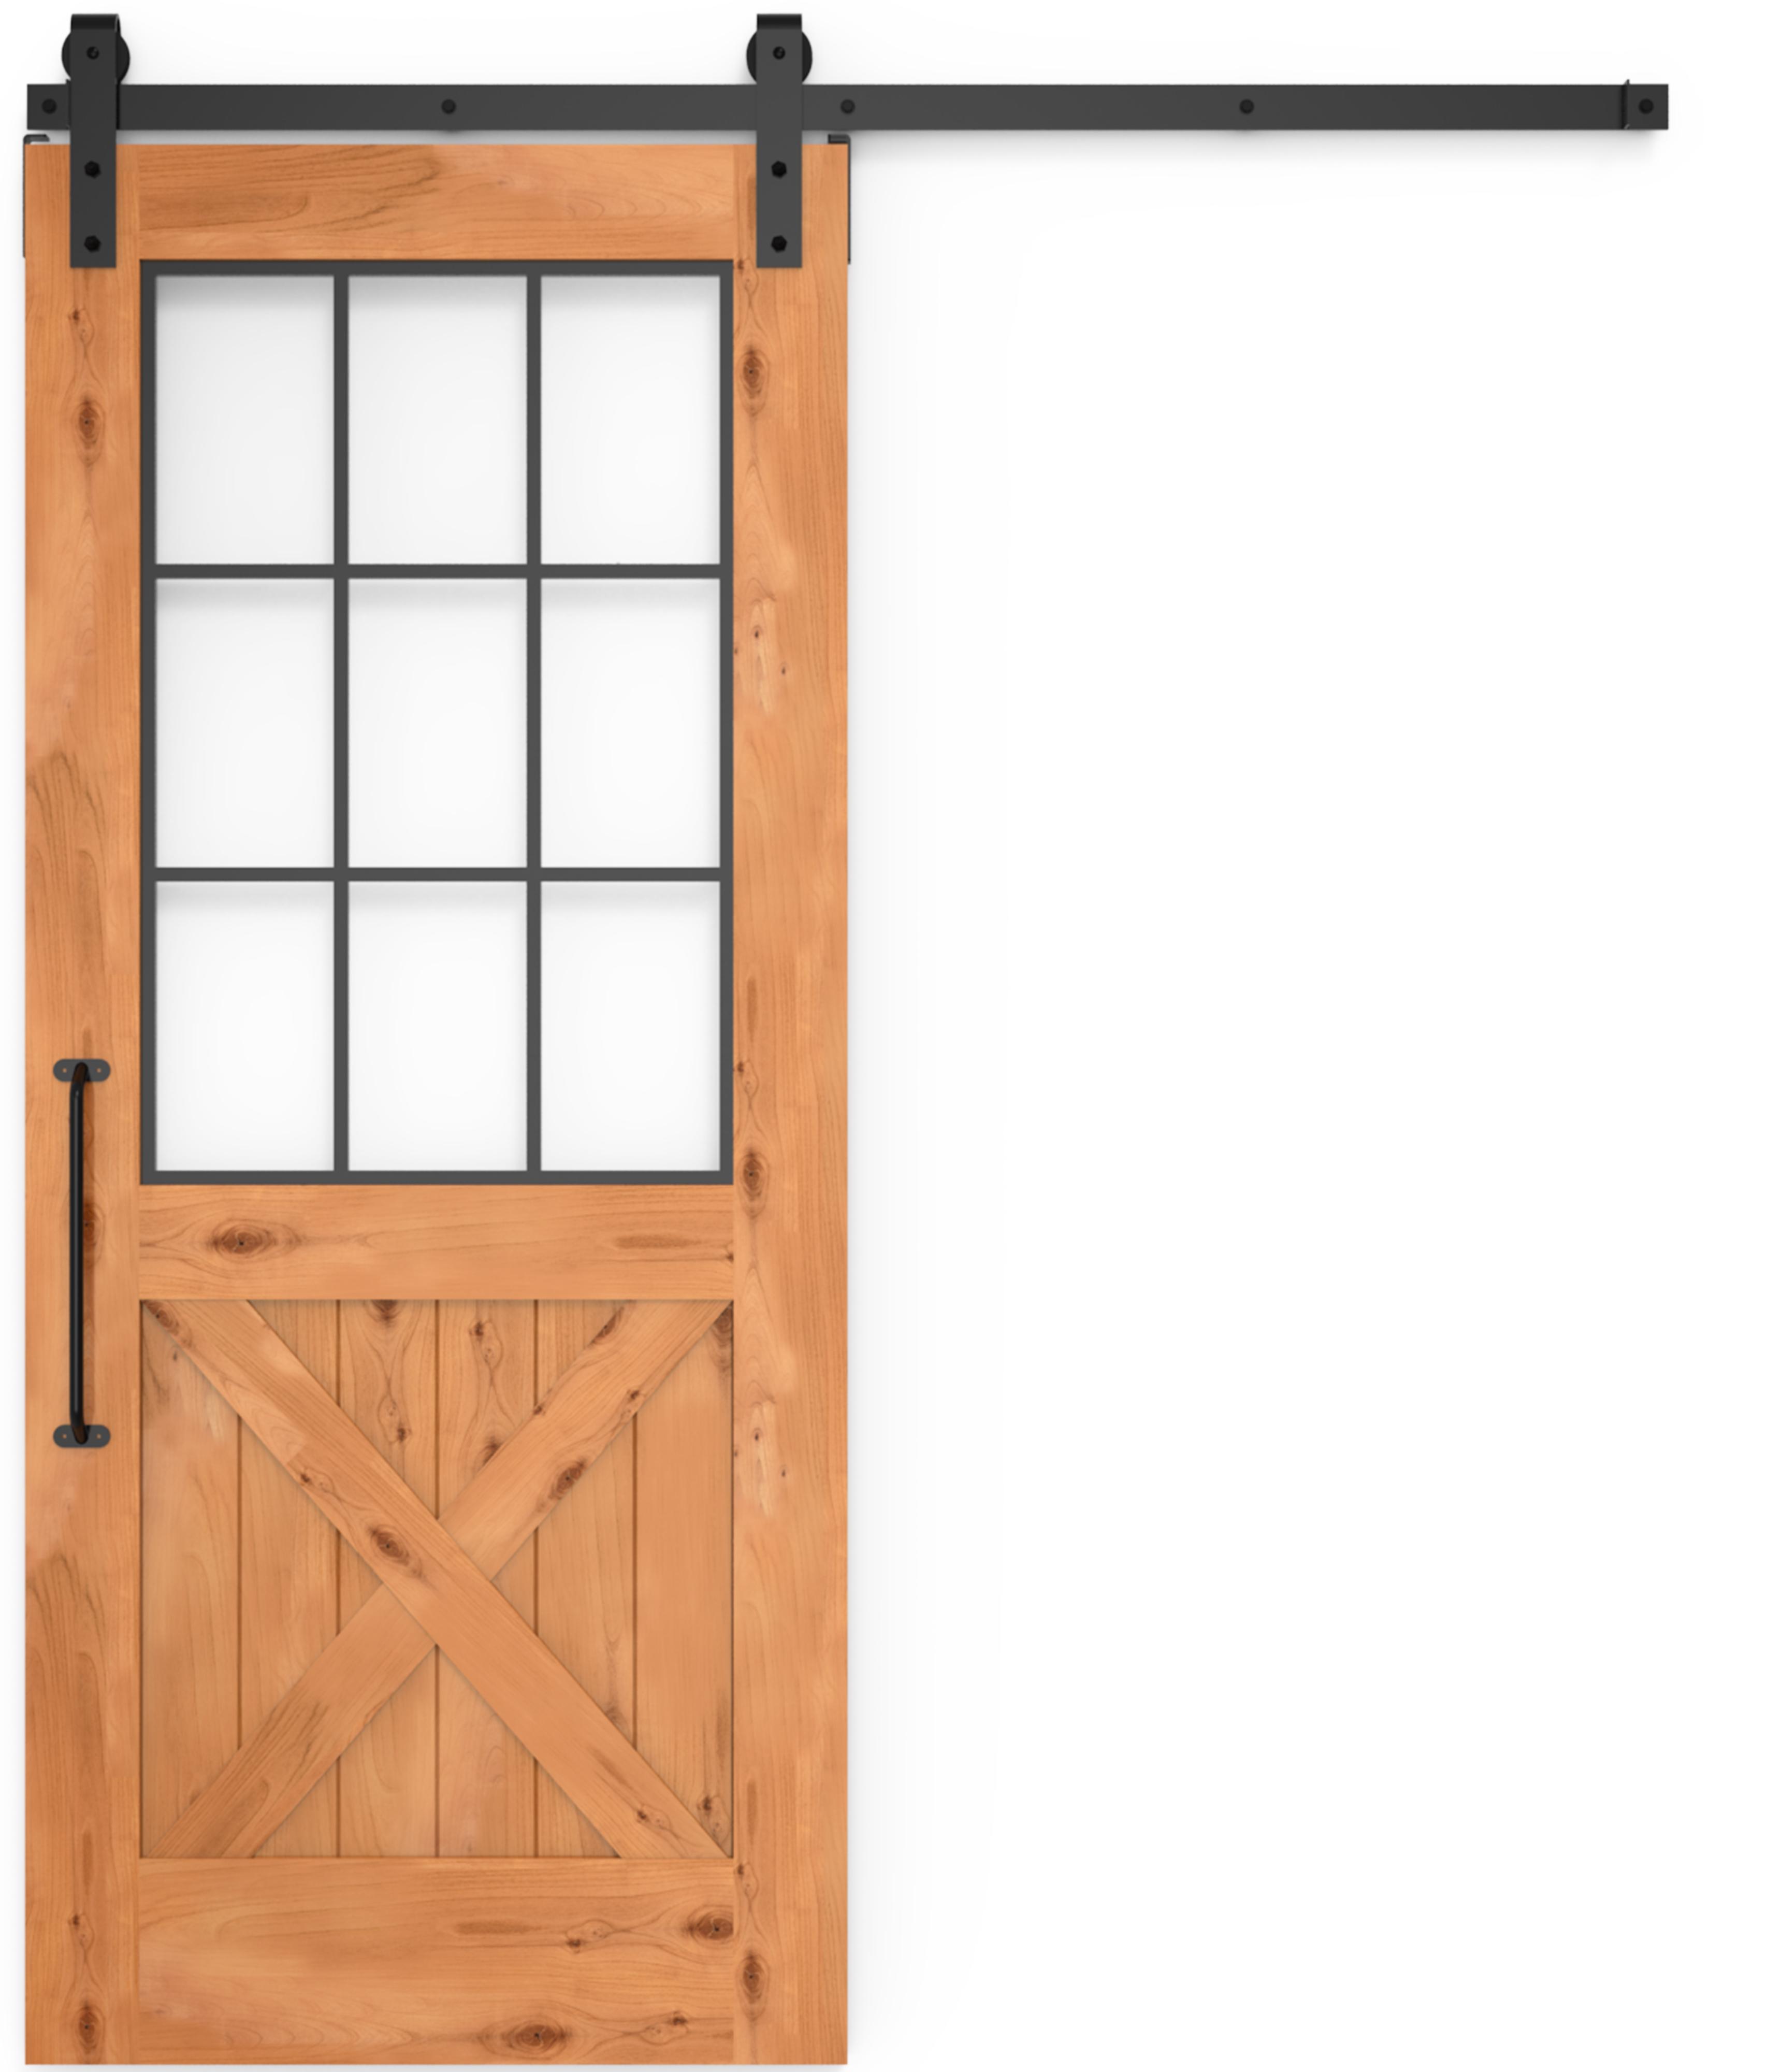 Half X French Barn Door Sliding Farmhouse Style Rustica